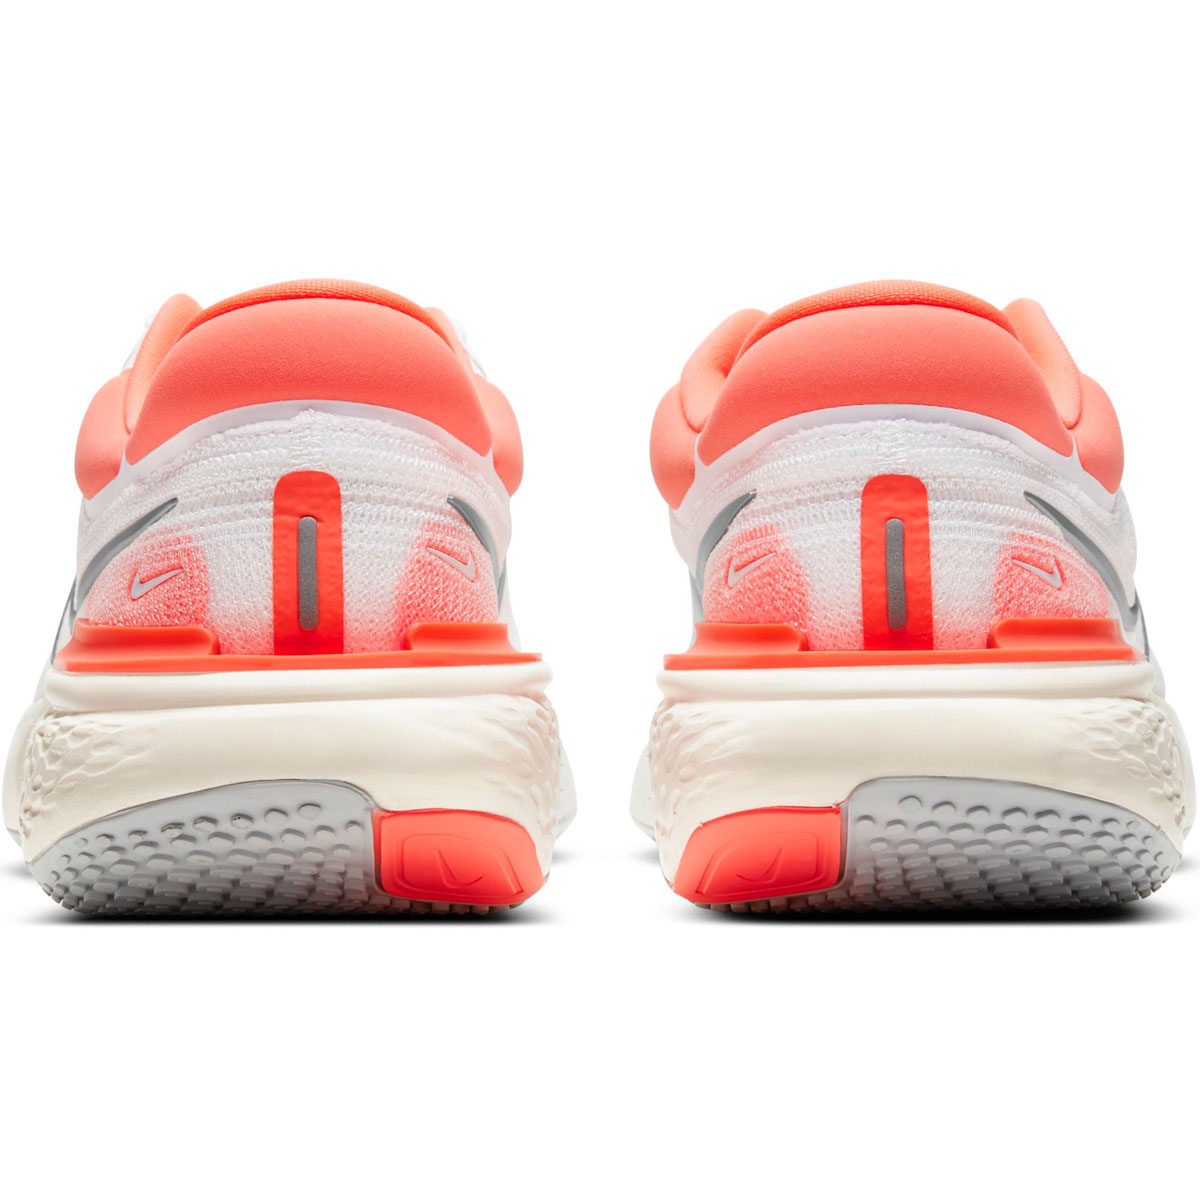 Women's Nike Zoomx Invincible Run FlyKnit Running Shoe - Color: White/Metallic Silver/Bright Mango - Size: 5 - Width: Regular, White/Metallic Silver/Bright Mango, large, image 4